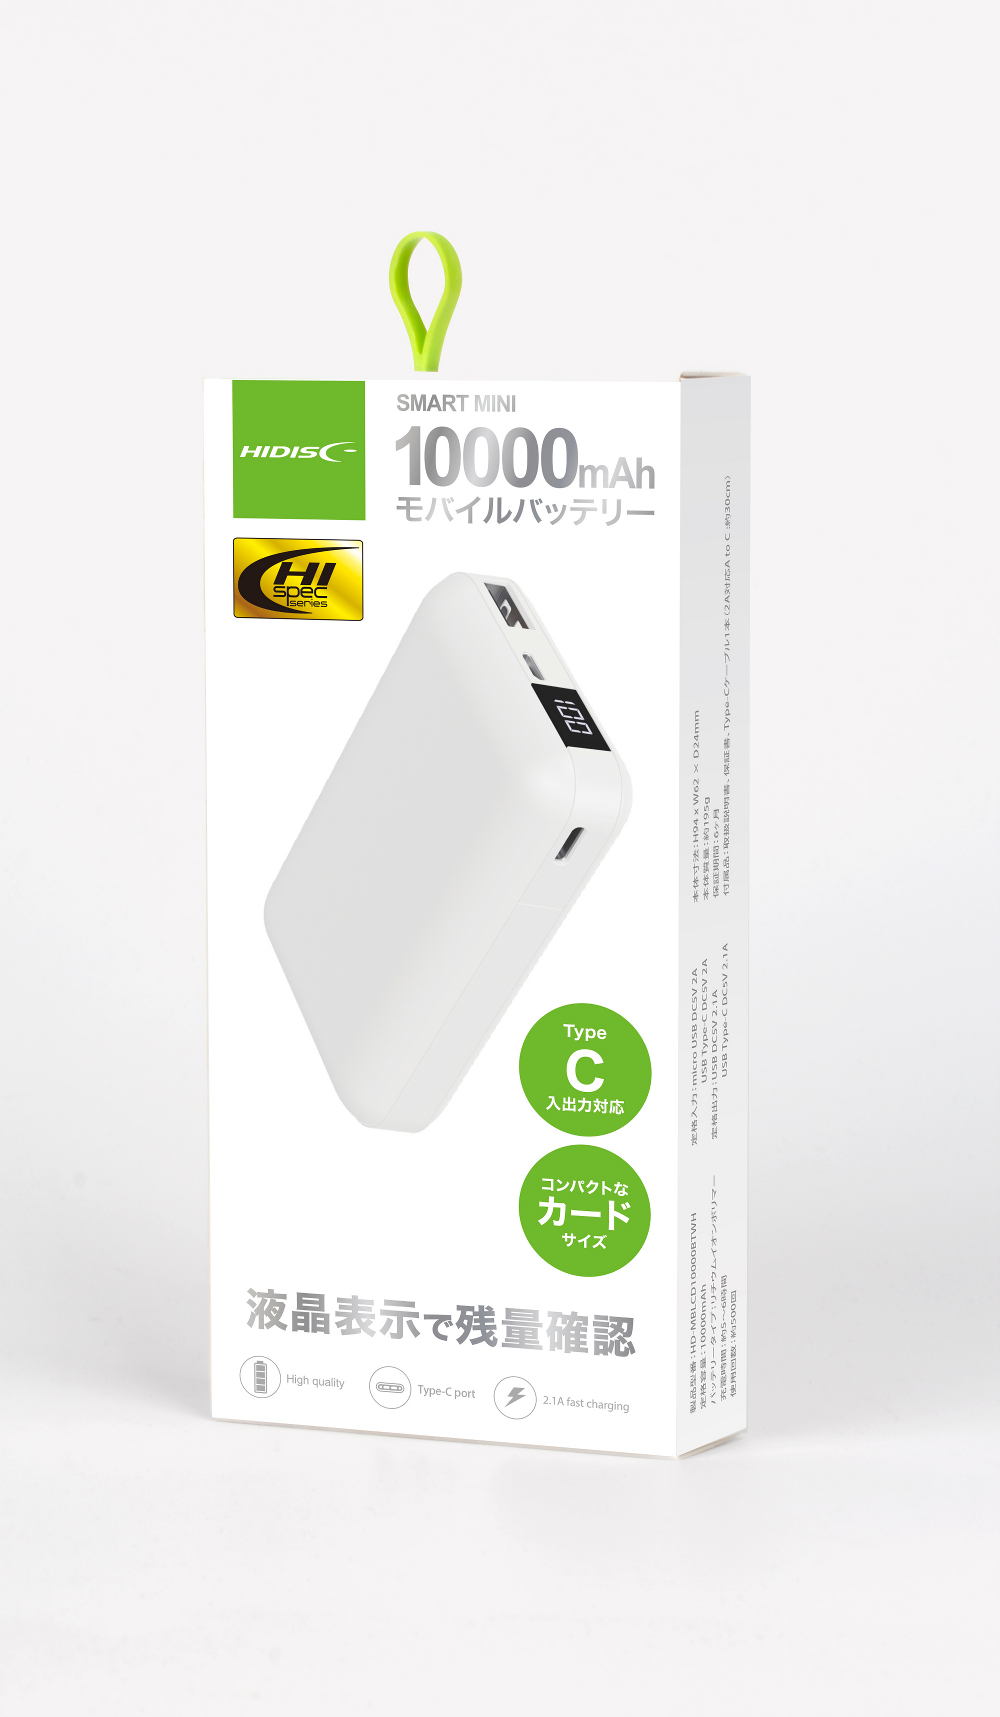 HIDISC  液晶表示で残量がわかるモバイルバッテリー カードサイズ, USB-Type C入出力可能 ホワイト HD-MBLCD10000BTWH